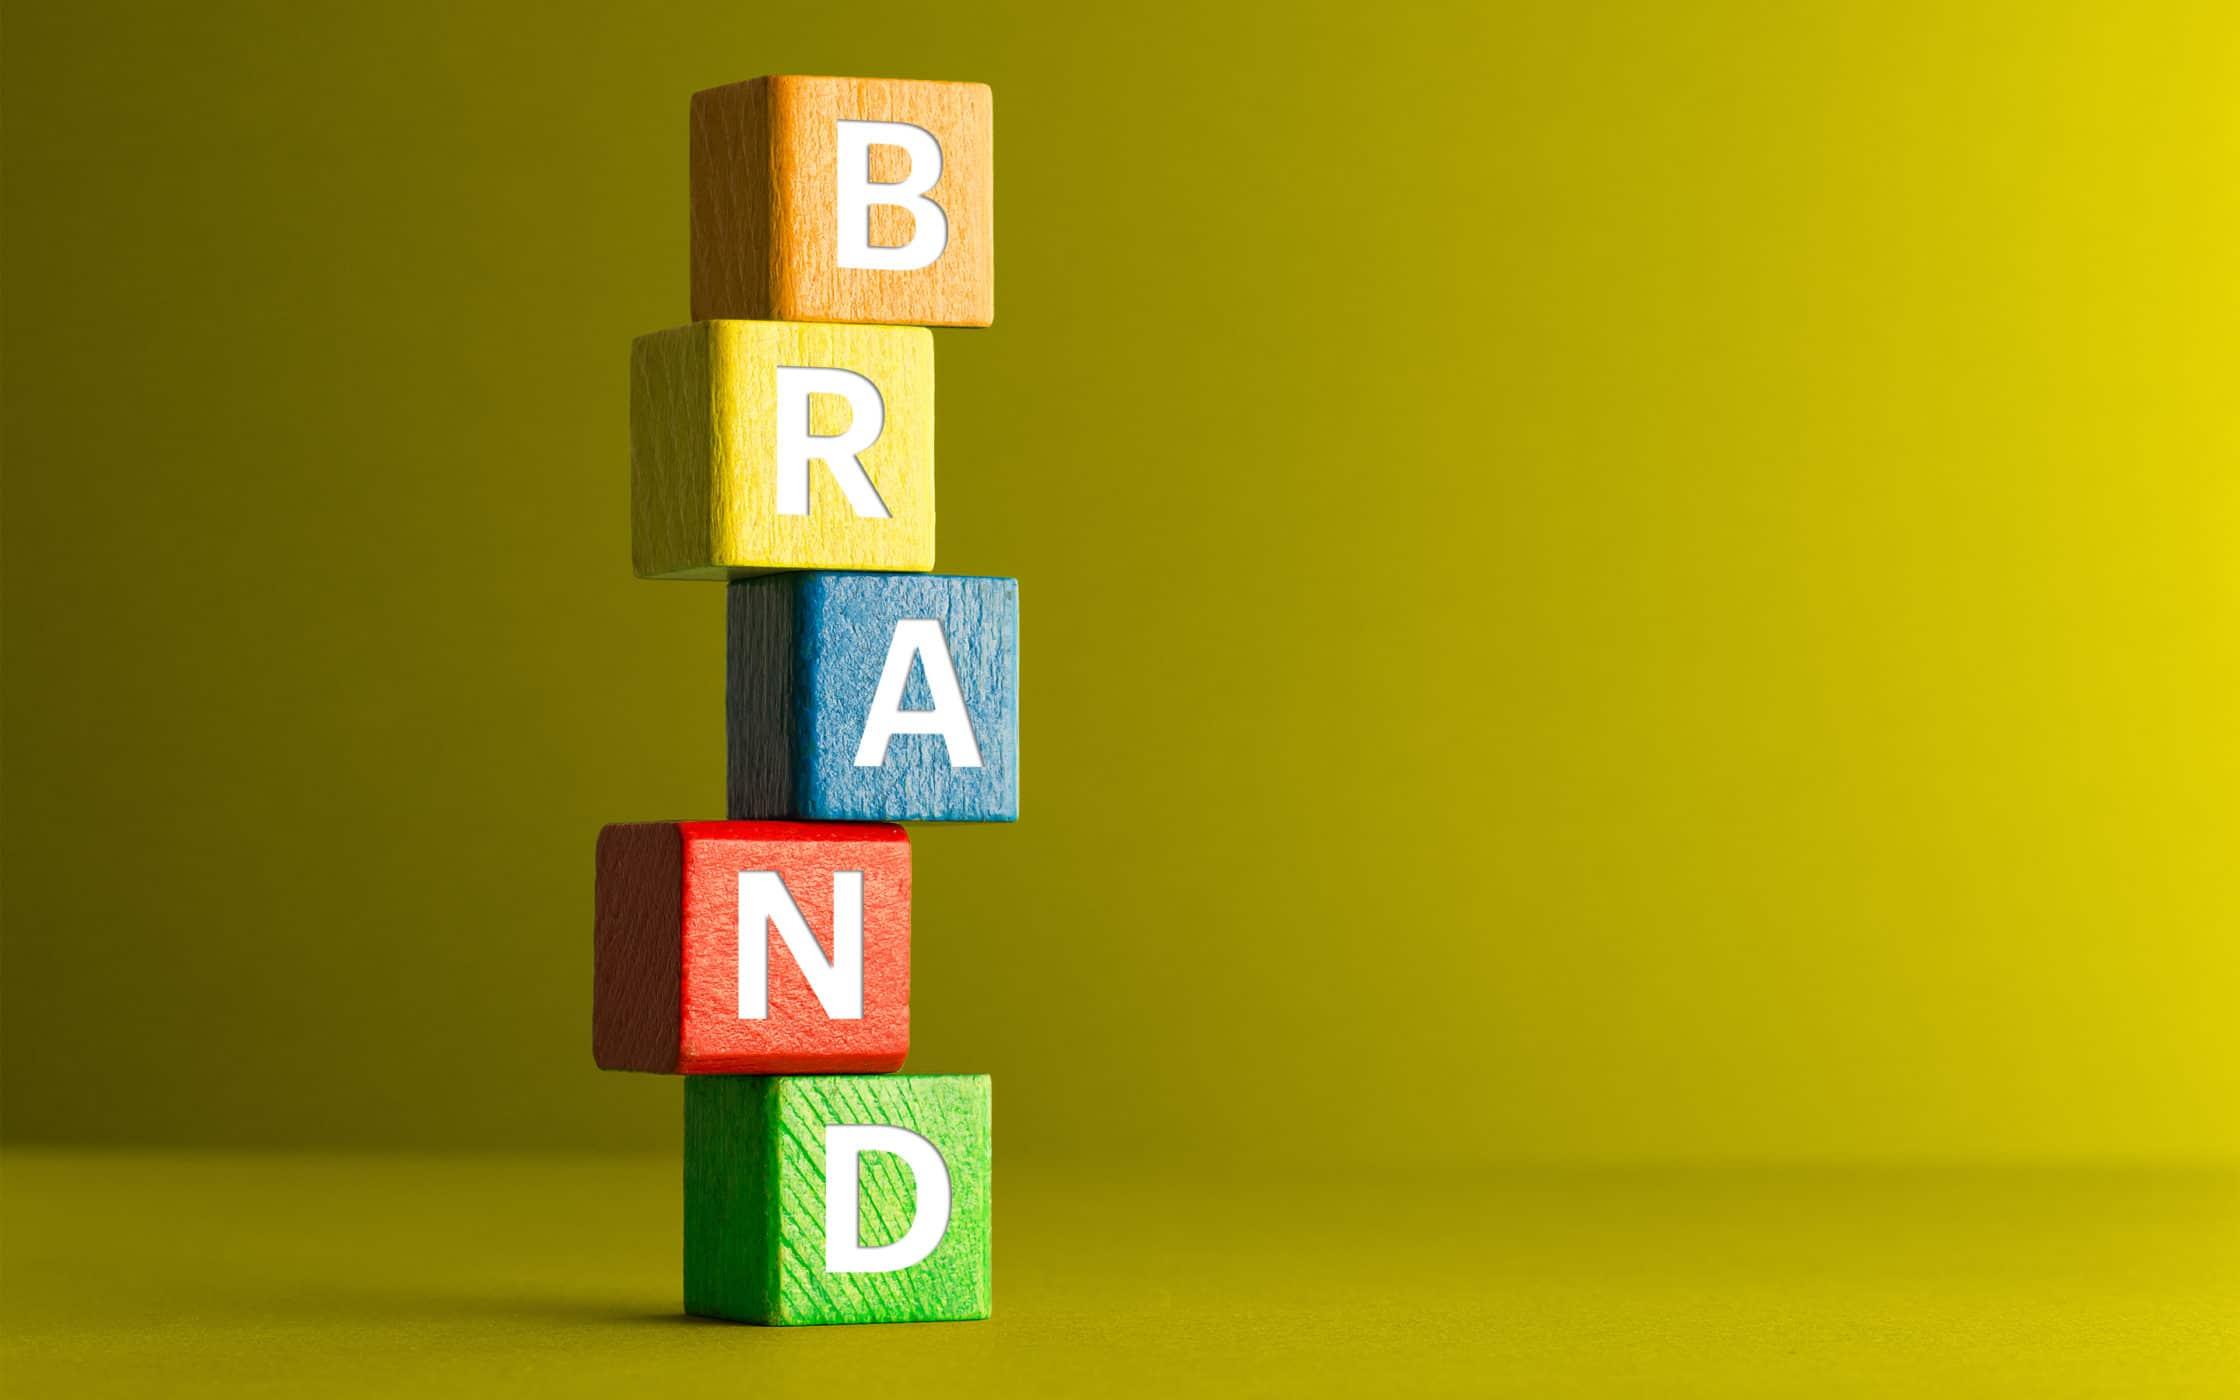 Sub-Branding